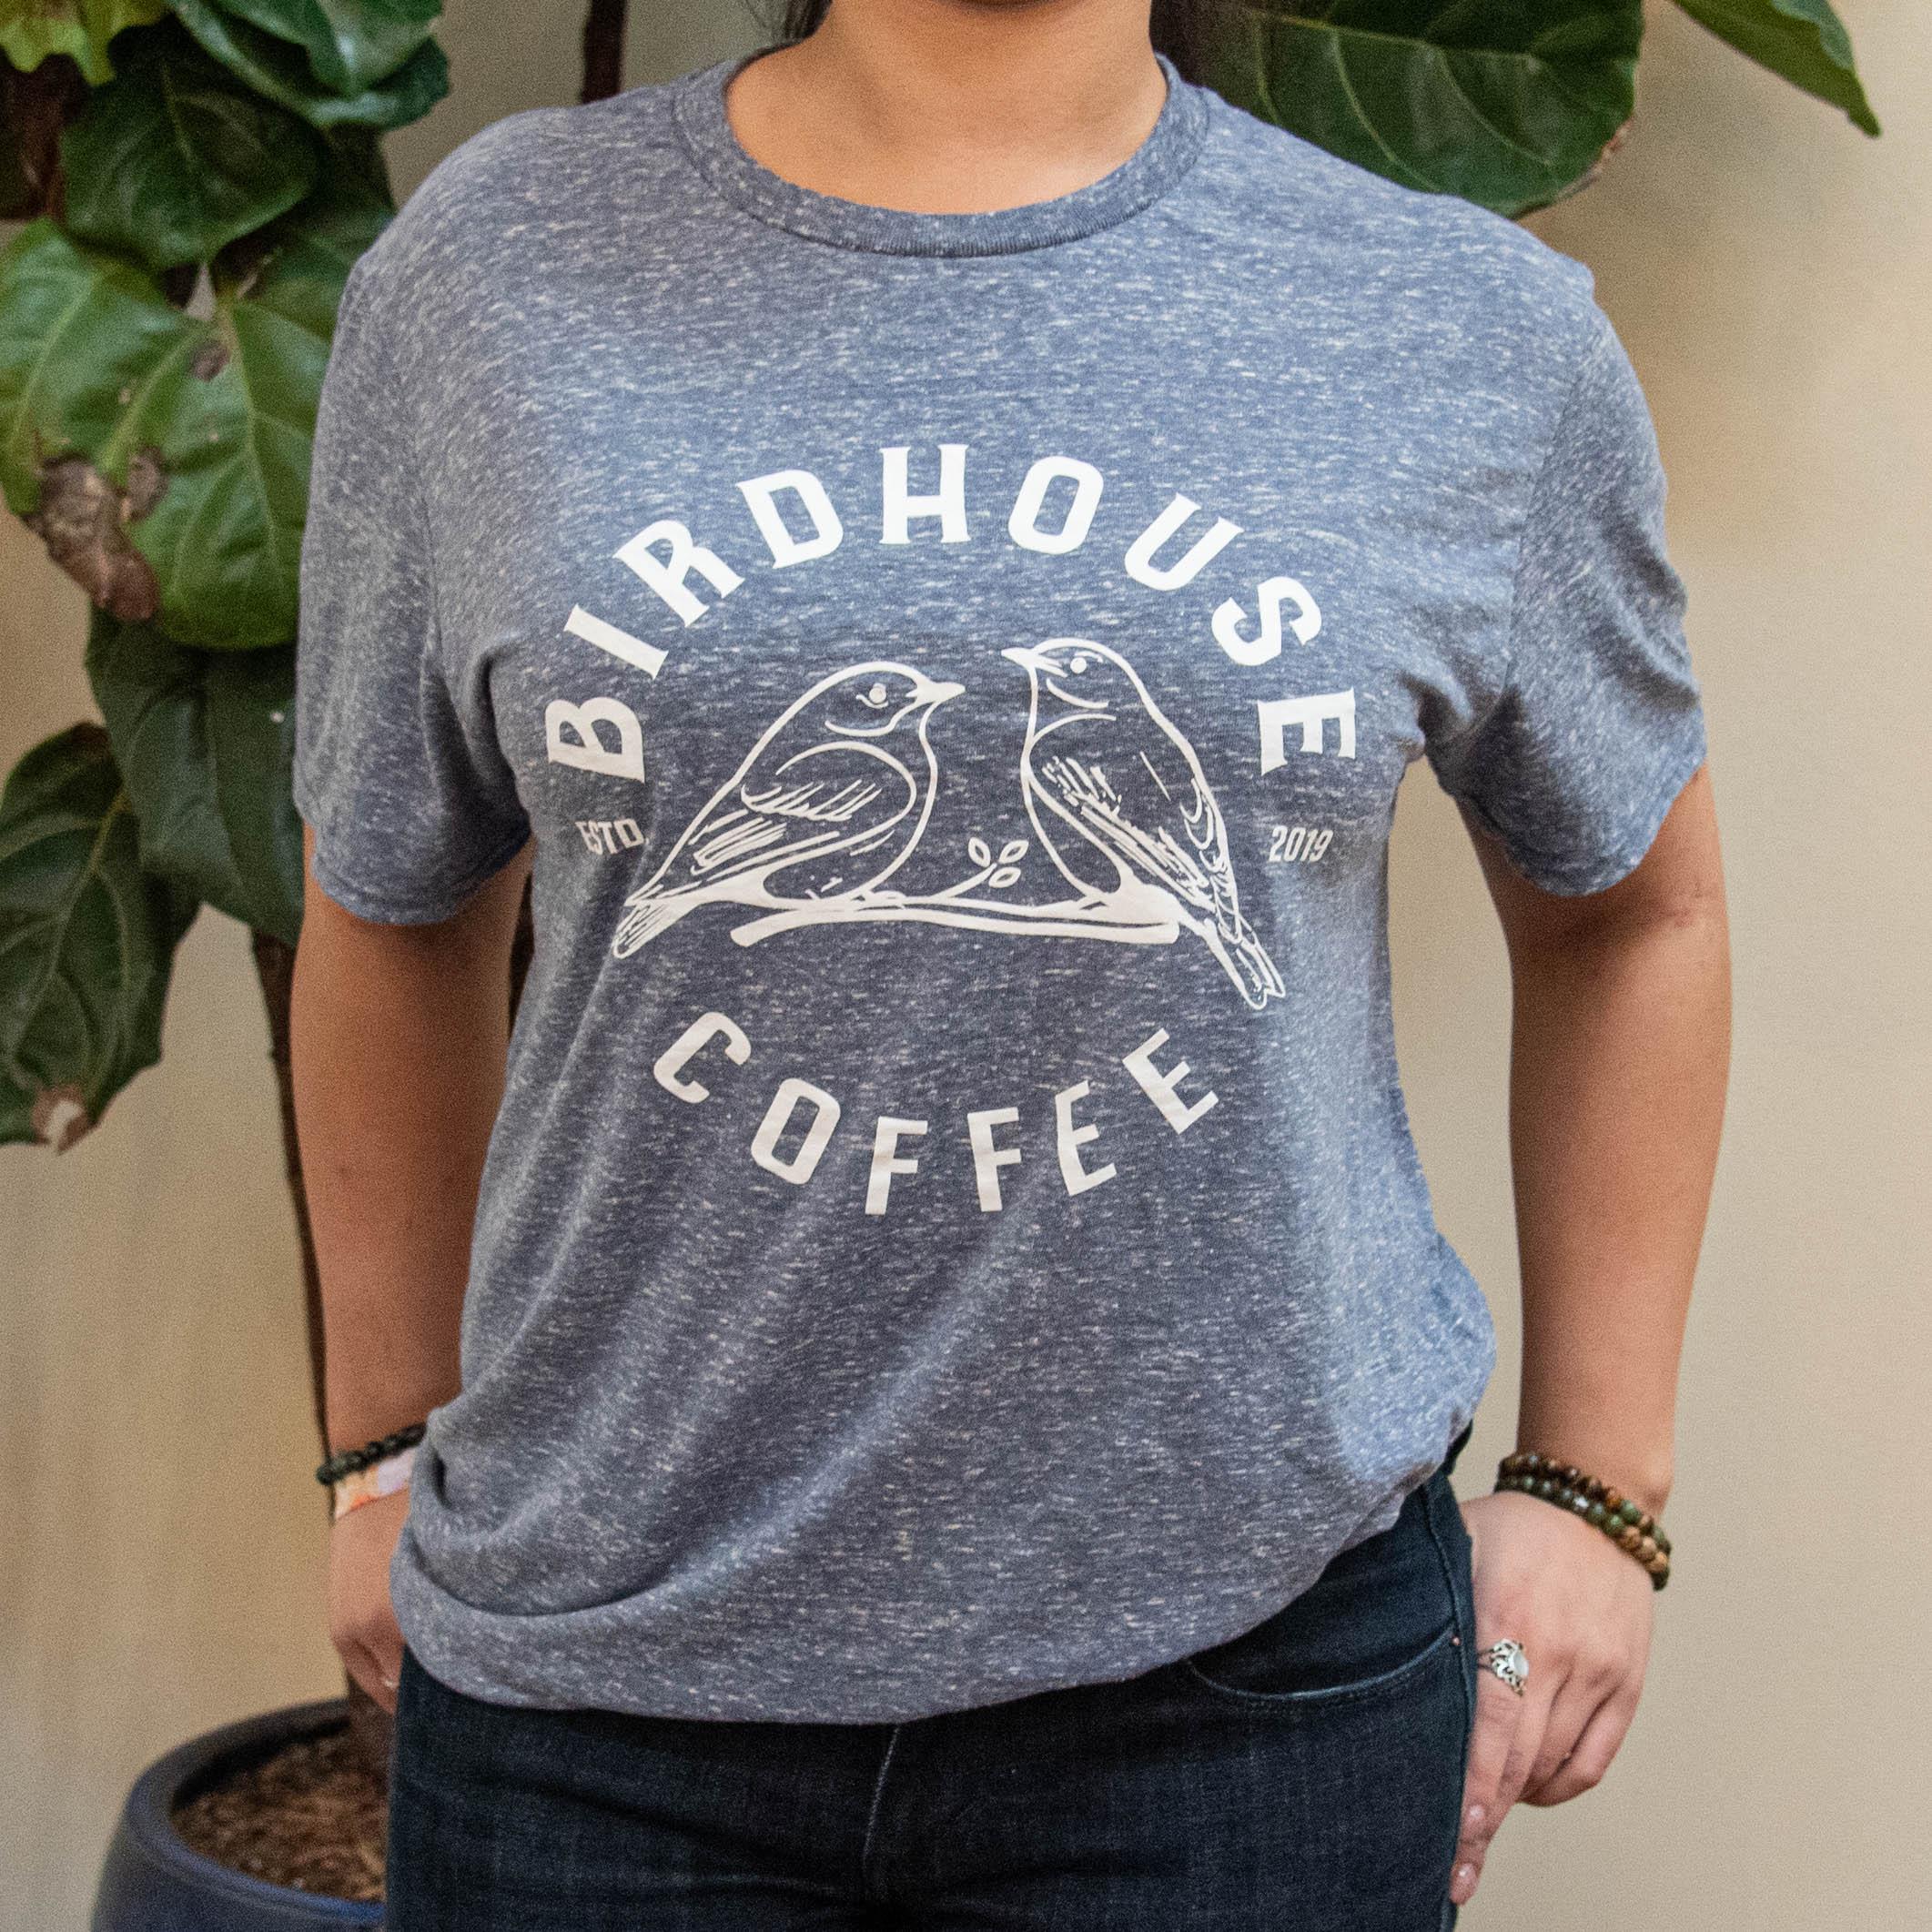 Birdhouse Unisex Crew Neck T-Shirt